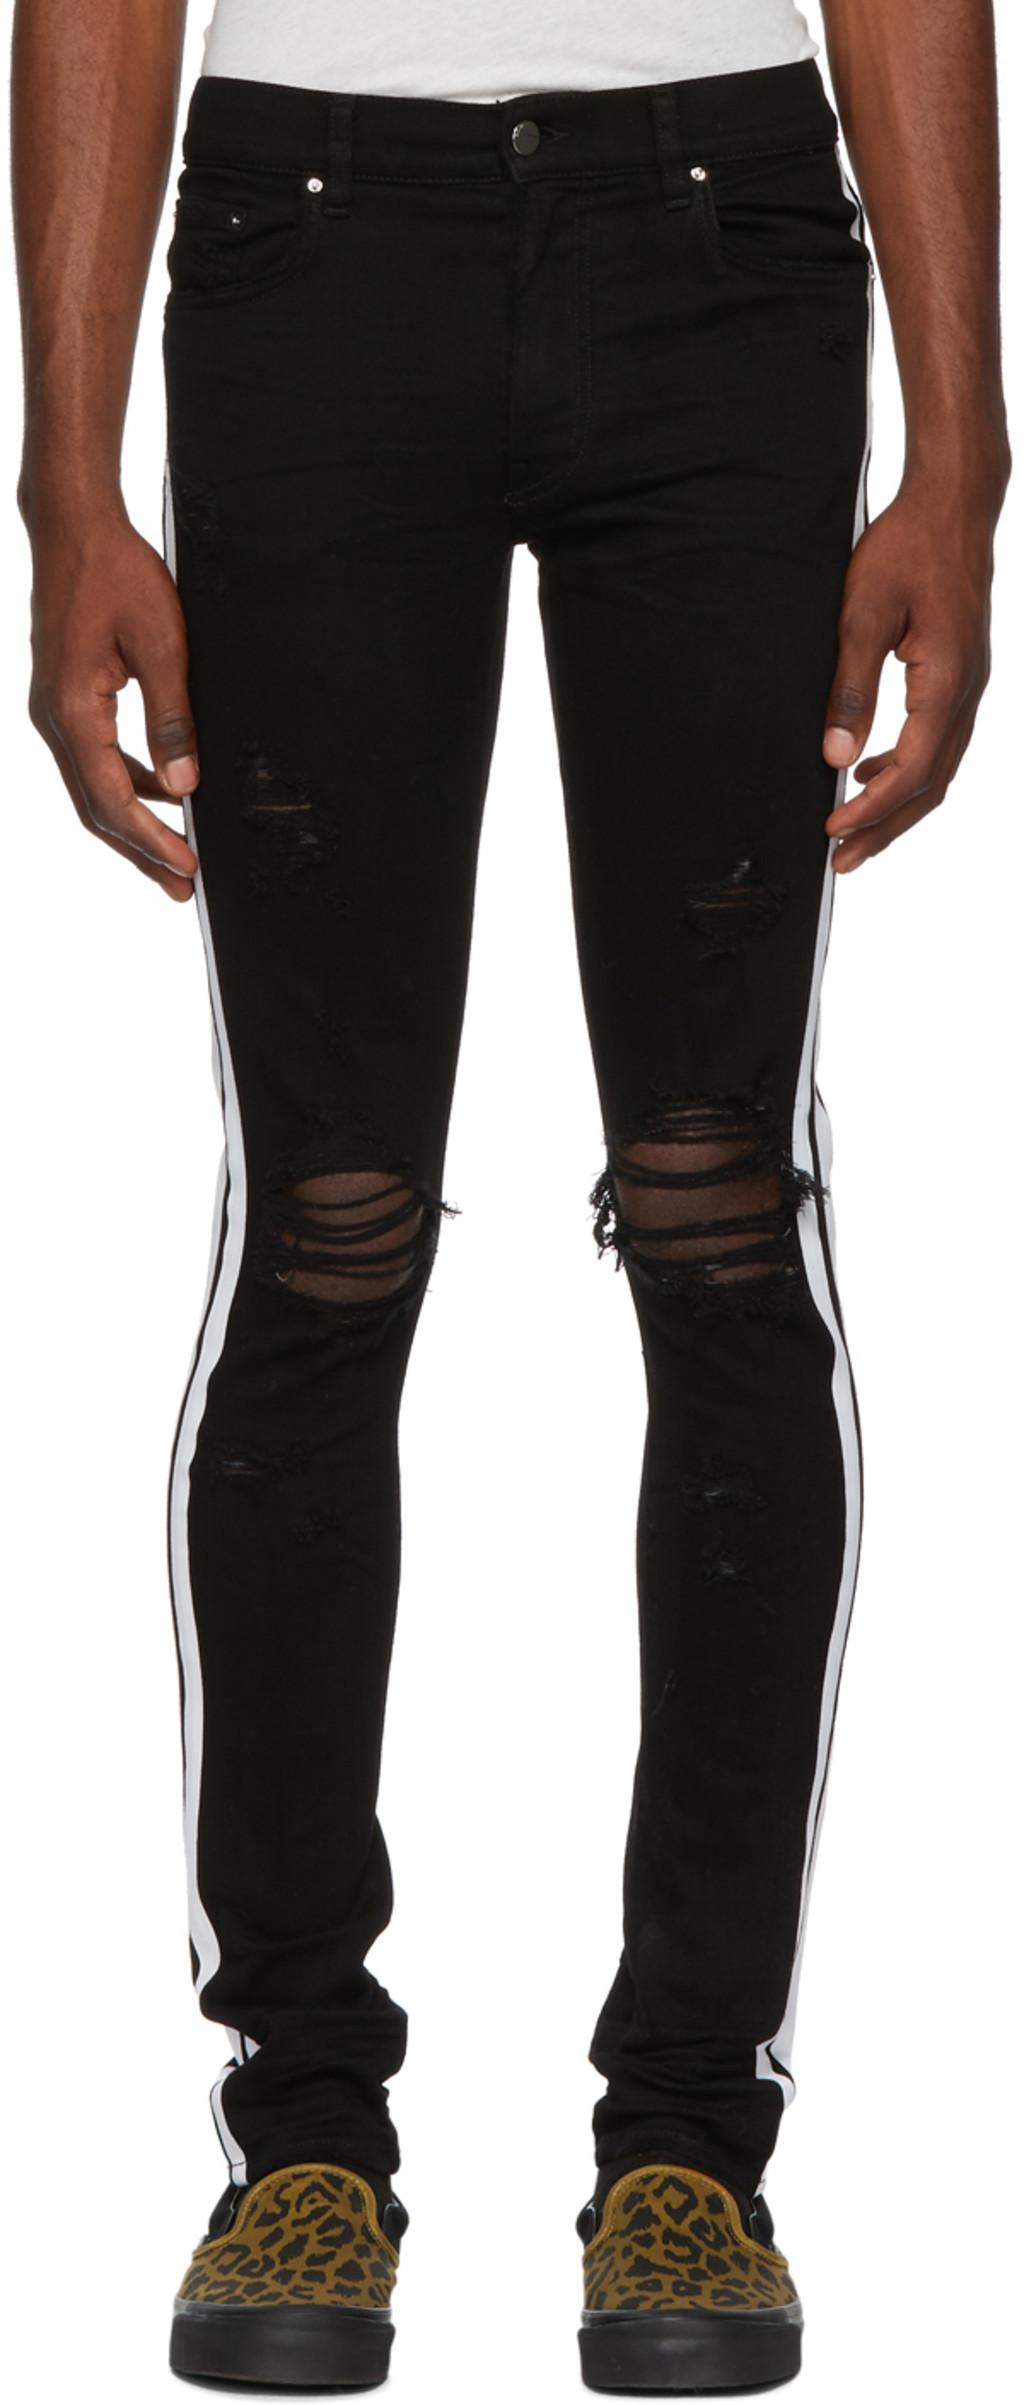 Designer Jeans For Men Ssense Biker Ripped Black Faded